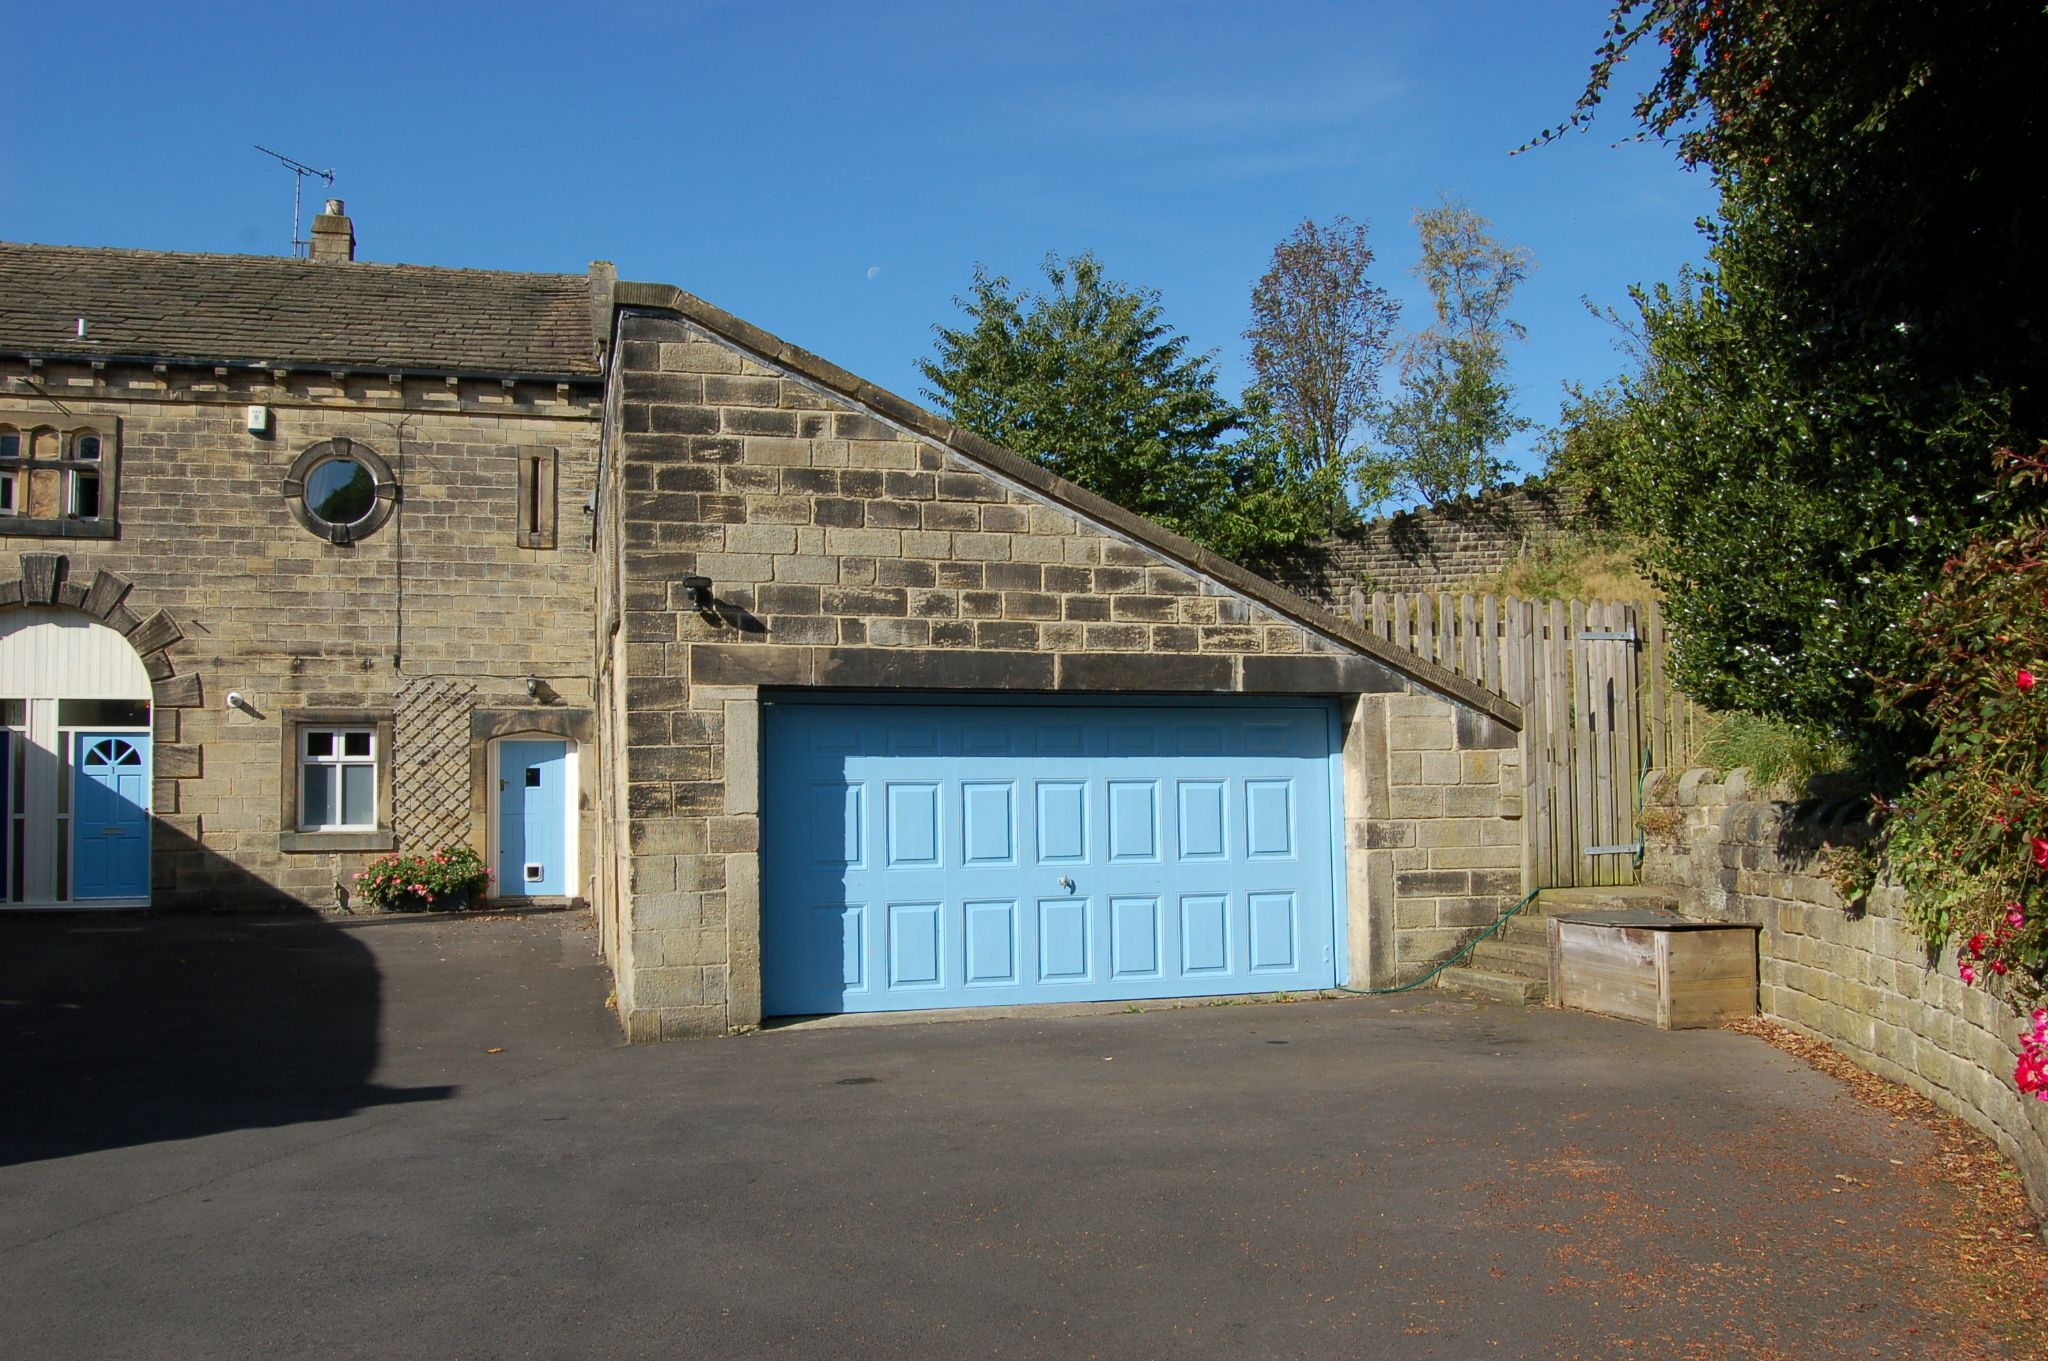 5 bedroom barn conversion house SSTC in Hebden Bridge - Photograph 1